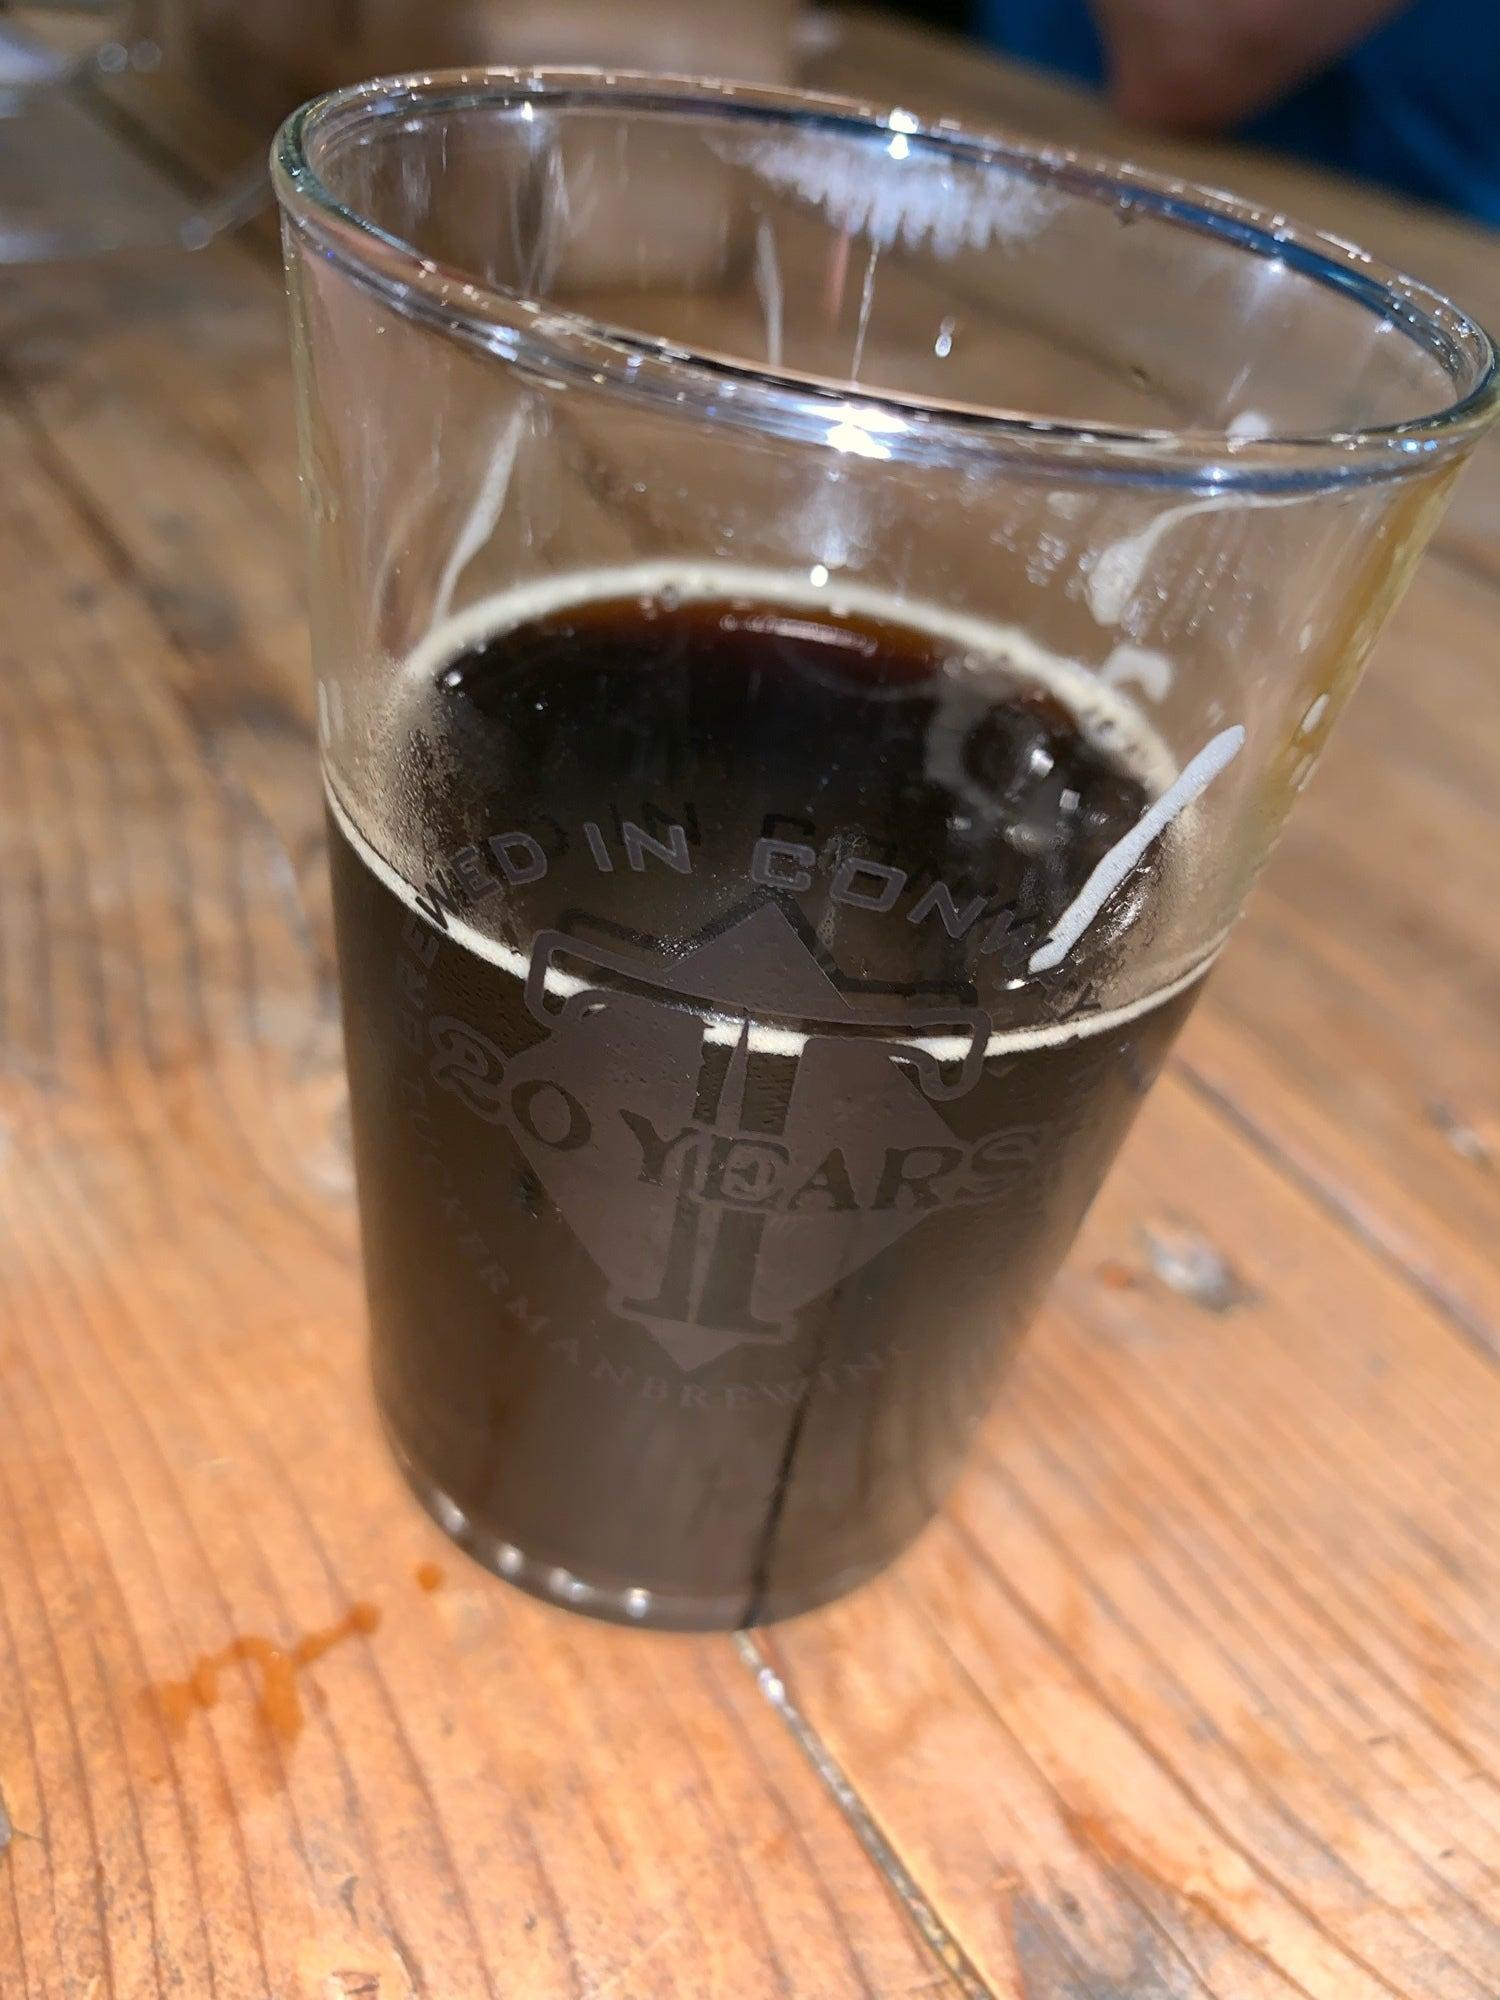 Tuckerman Brewing Co | Tickets, Deals, Reviews, Family